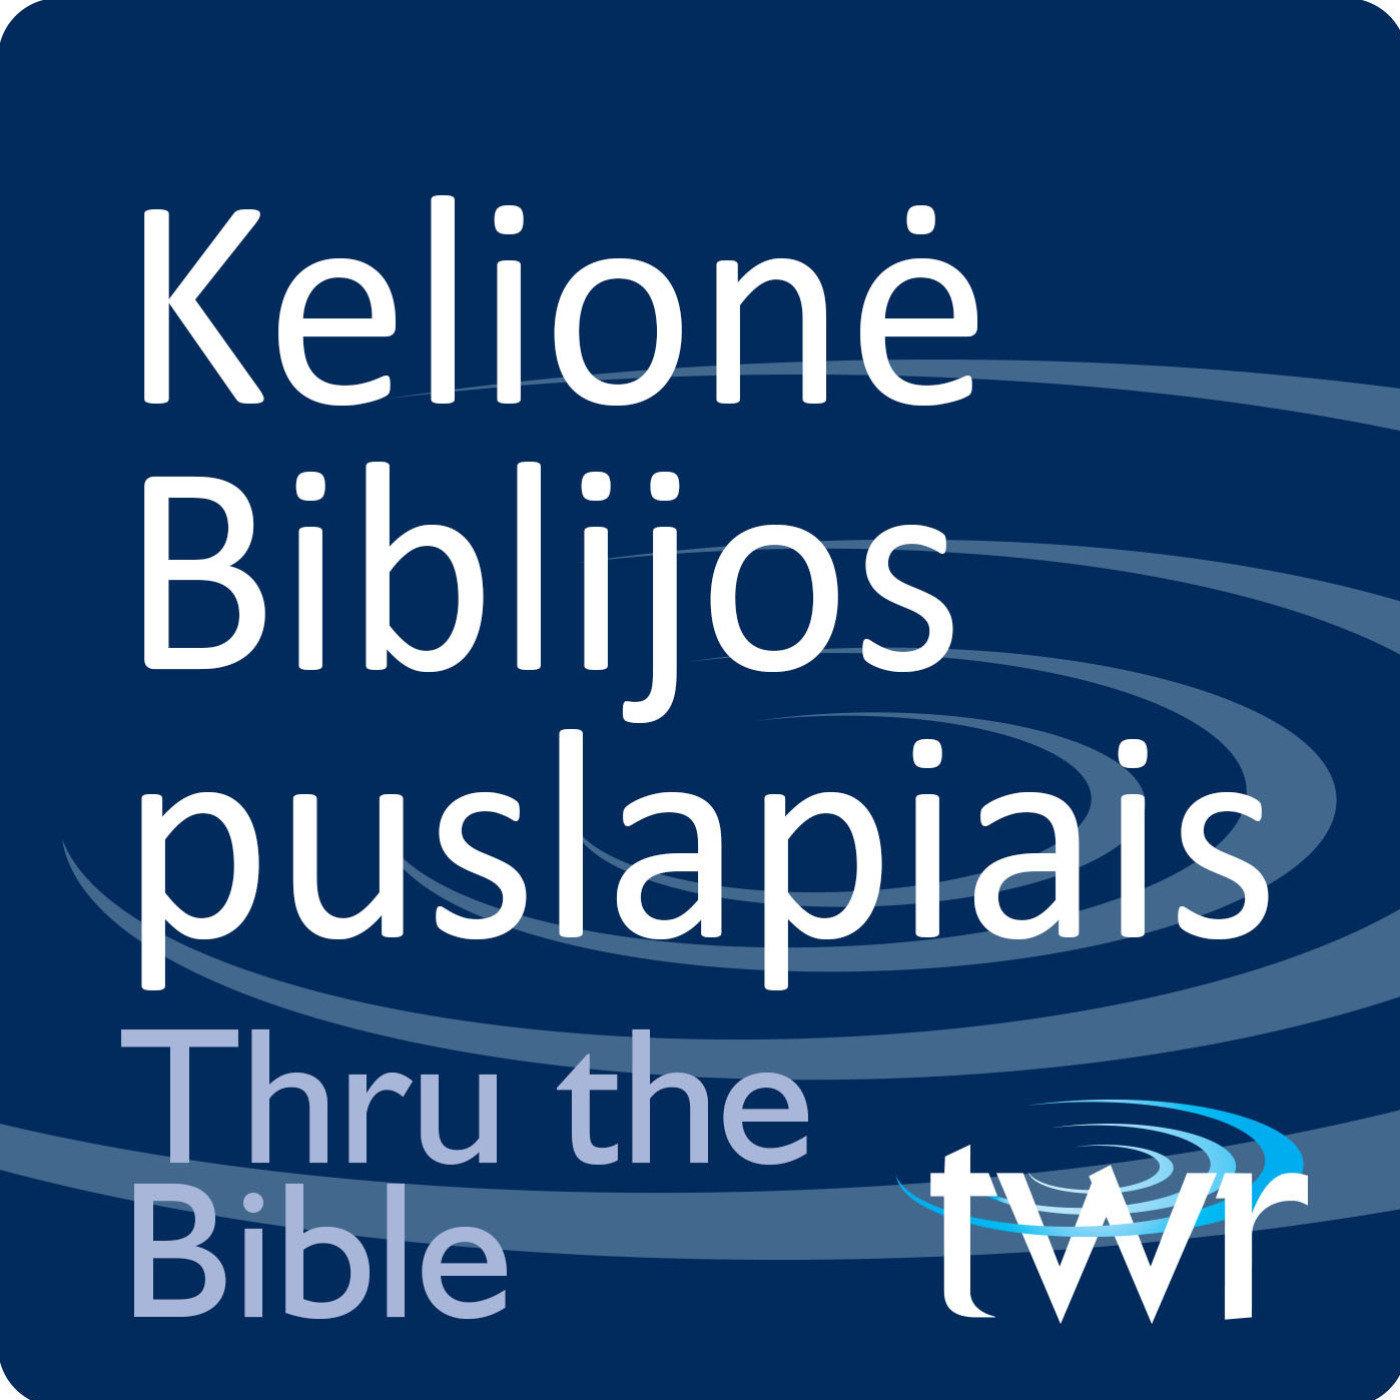 Kelionė Biblijos puslapiais @ ttb.twr.org/lithuanian